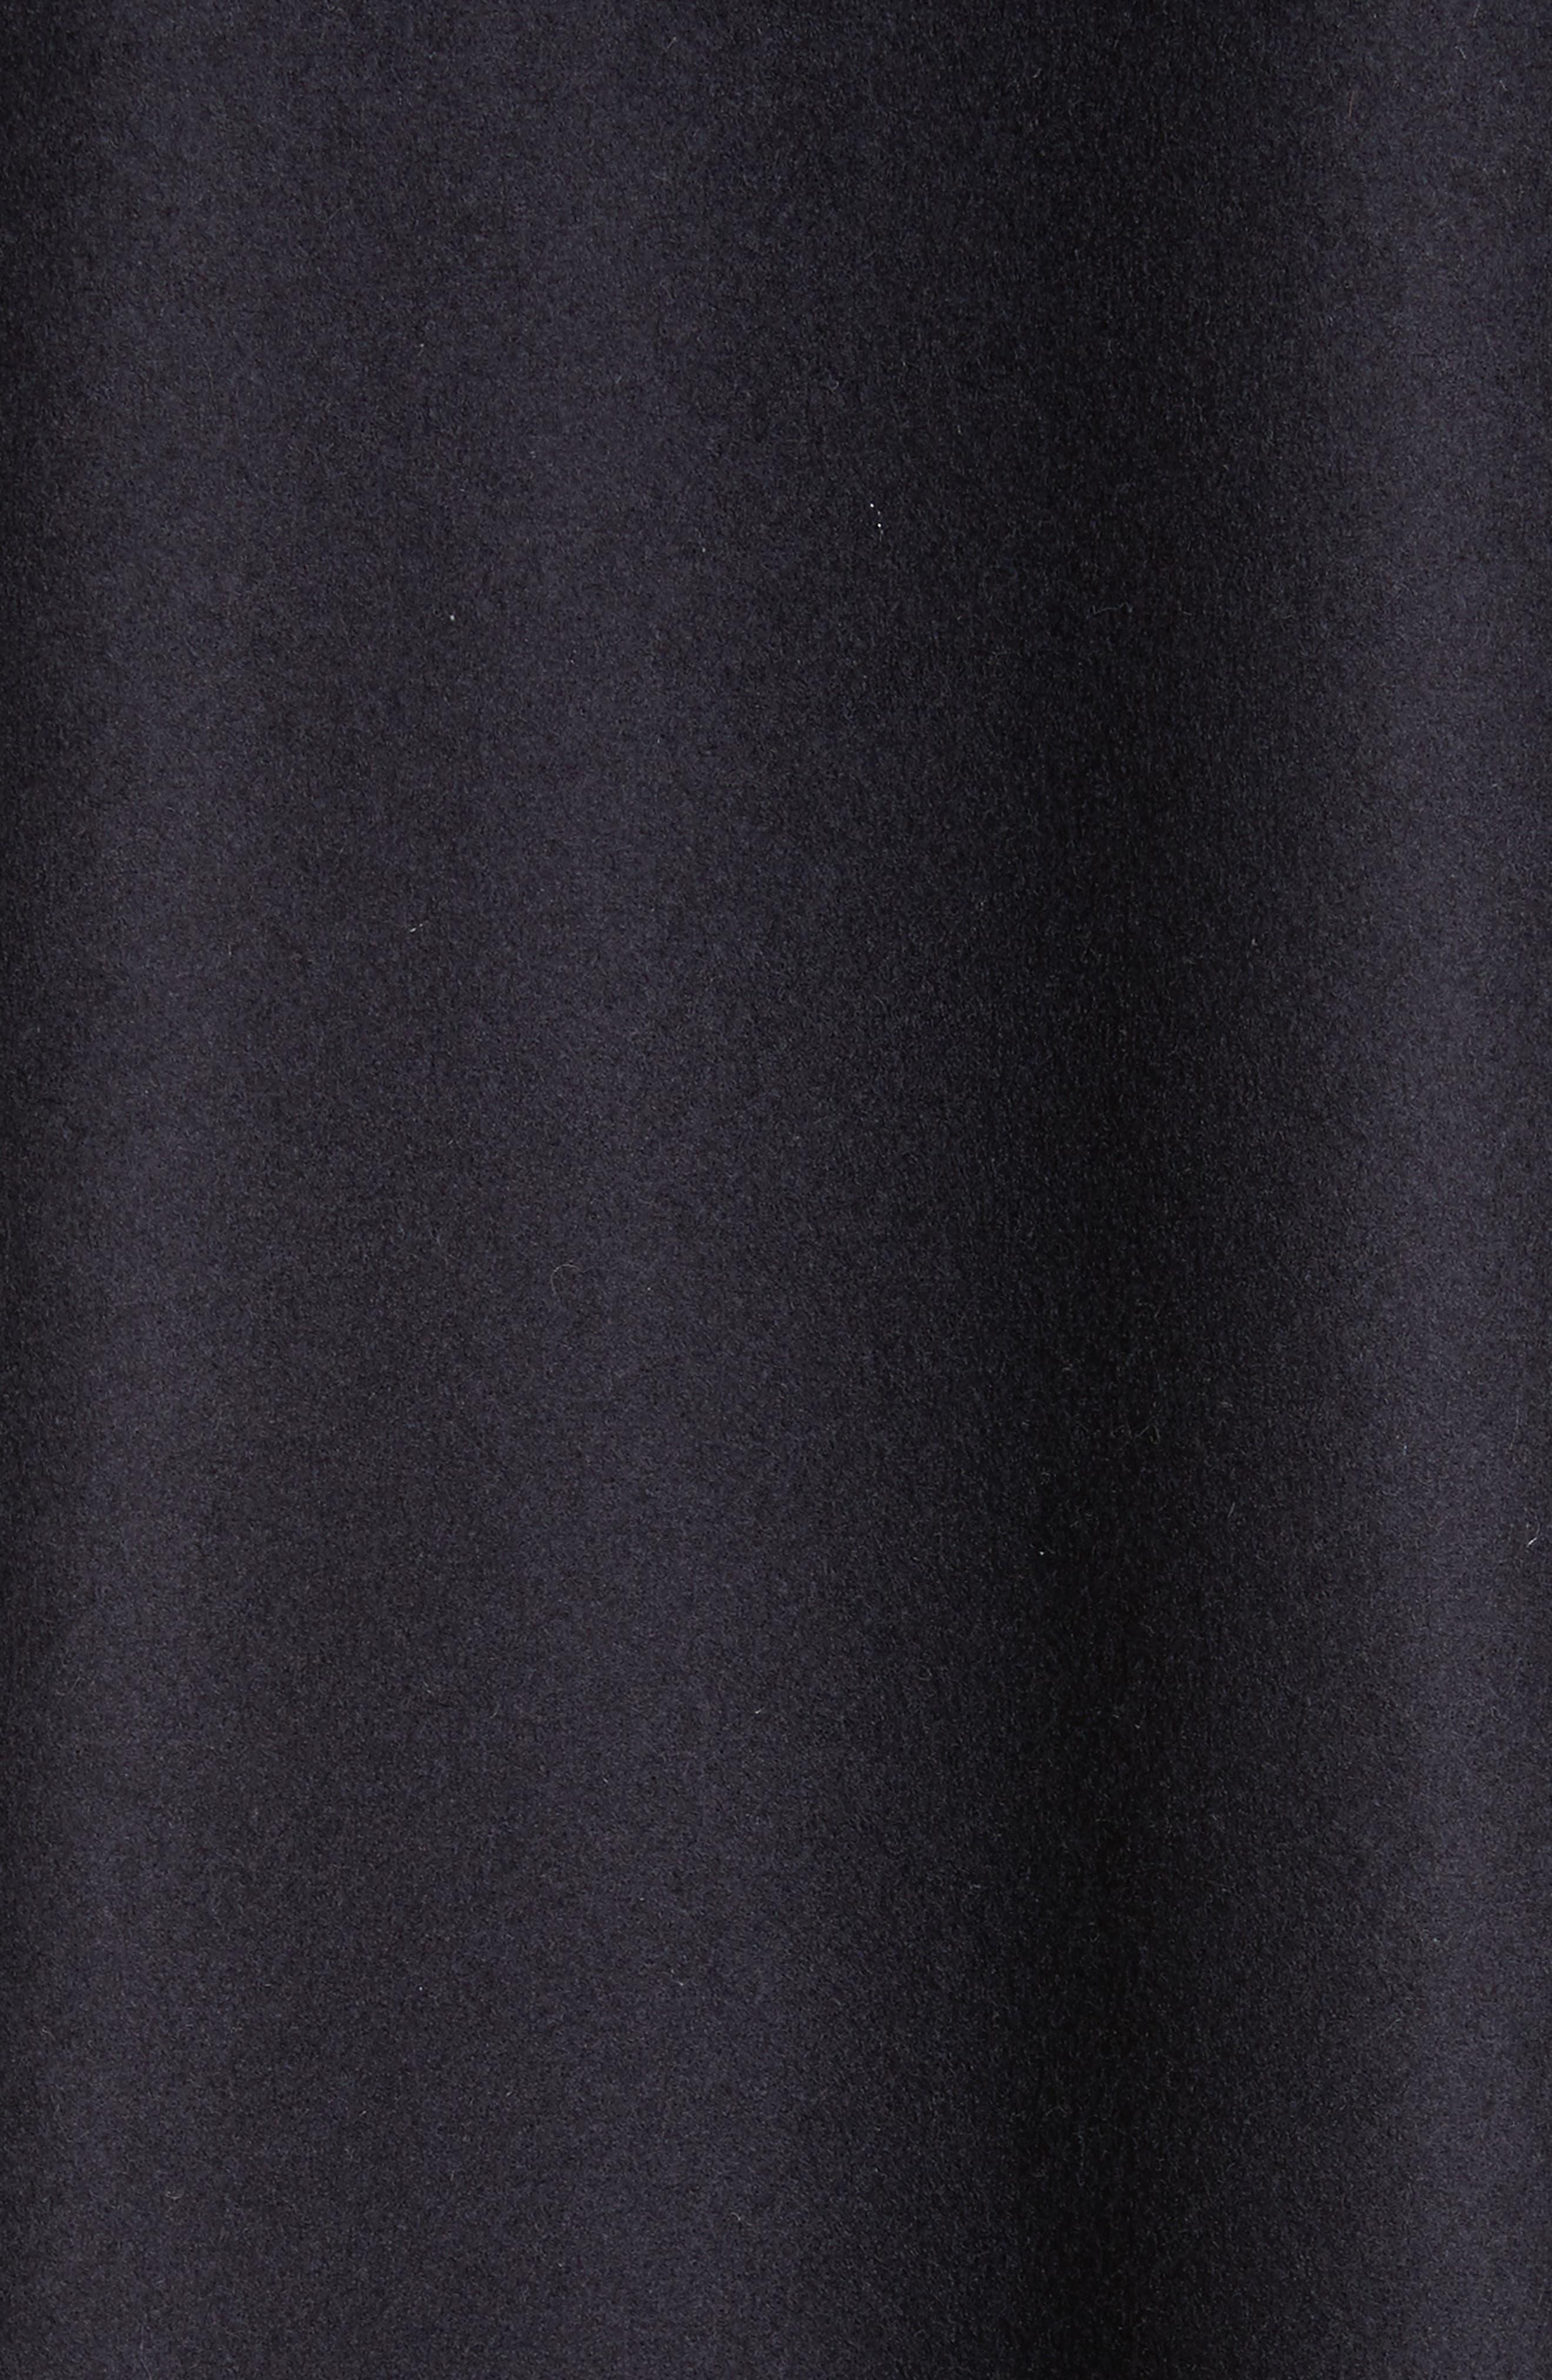 Grenat Wool & Cashmere Hooded Jacket,                             Alternate thumbnail 5, color,                             419